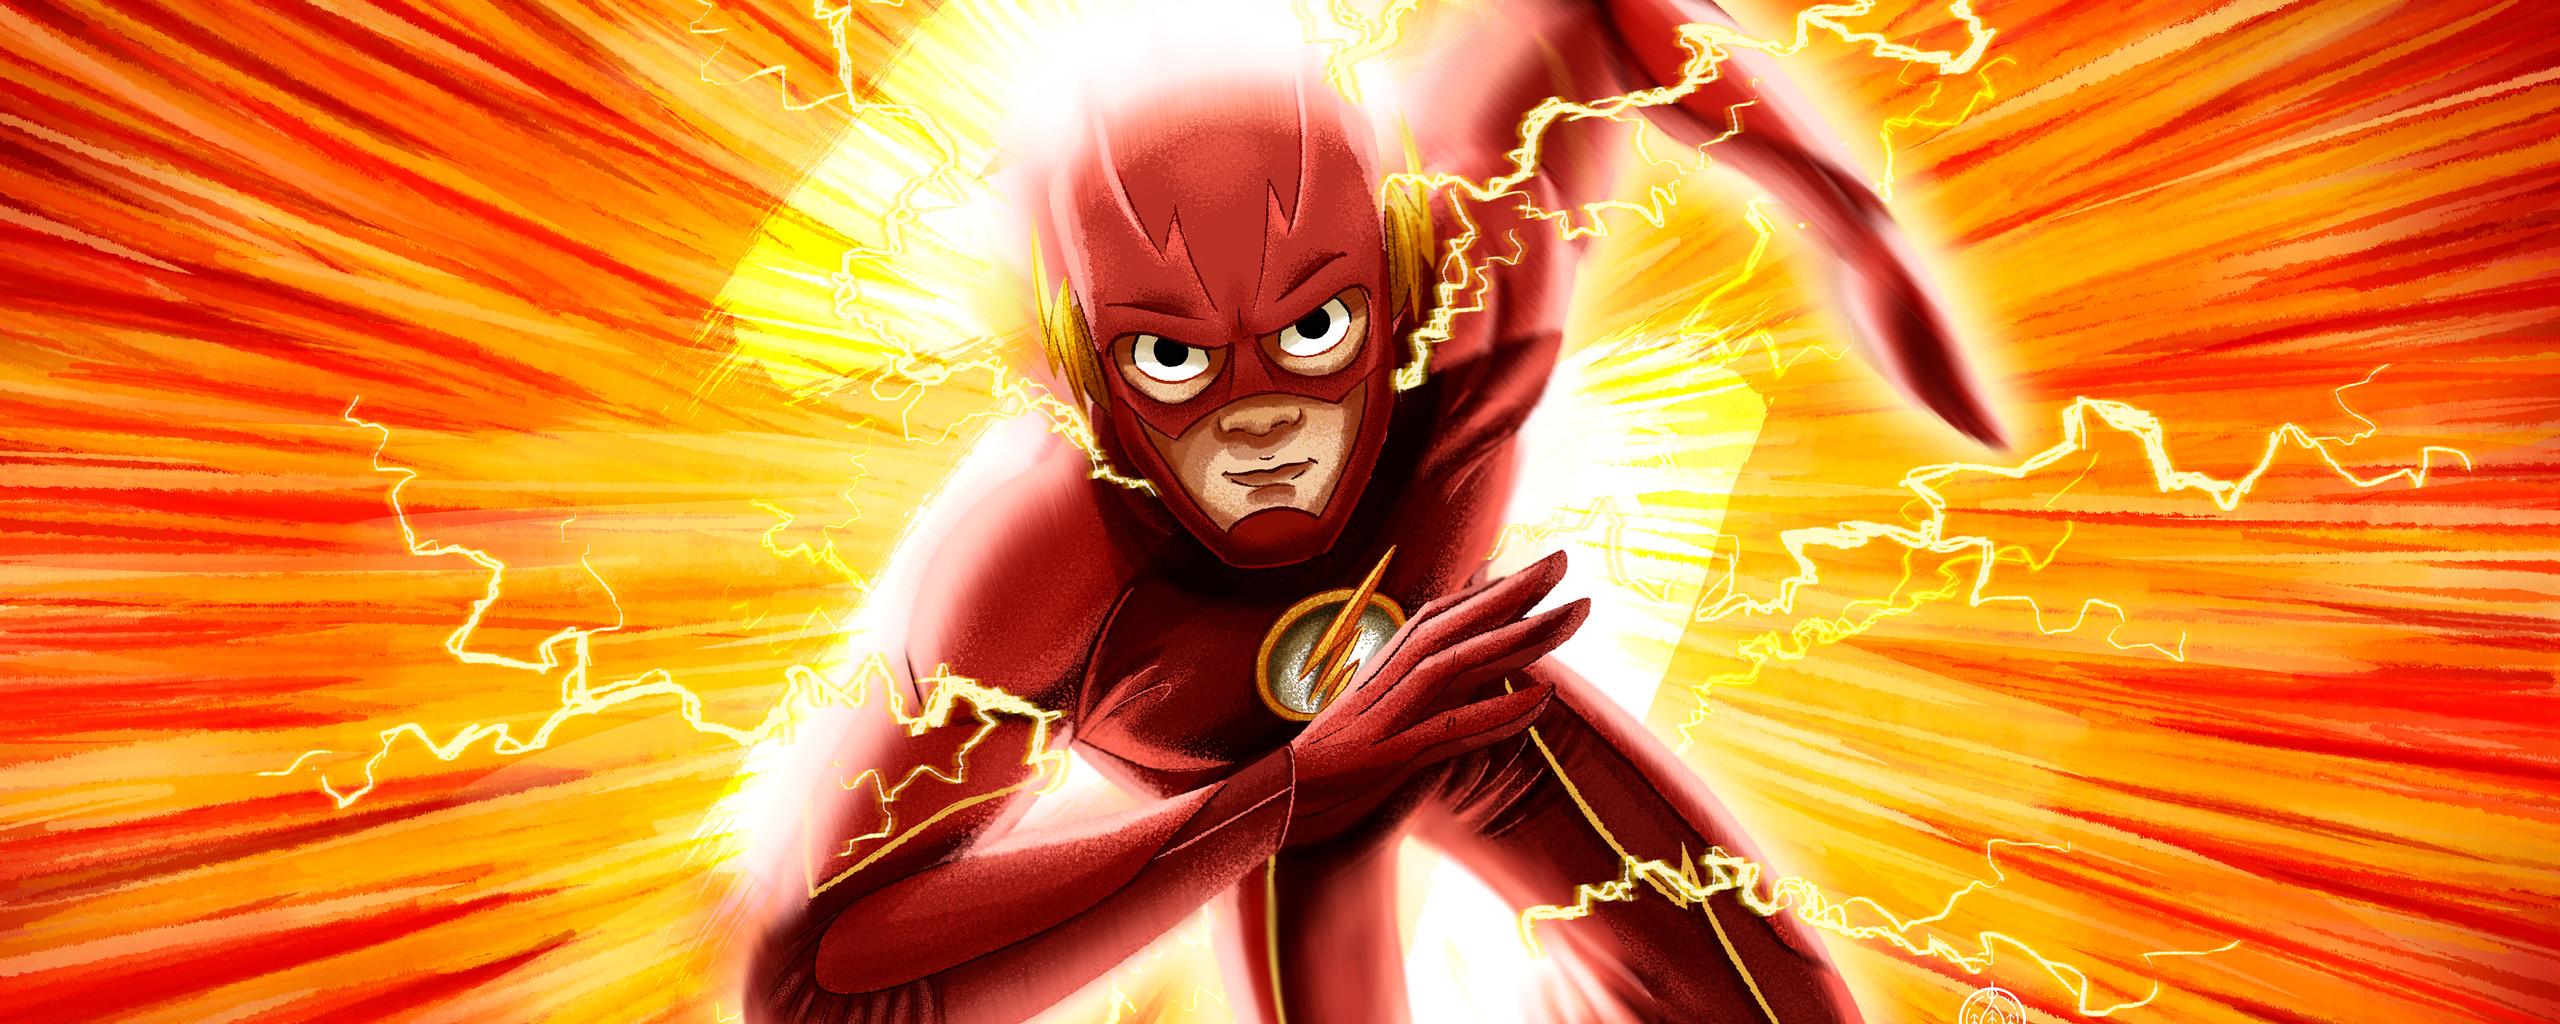 the-flash-illustration-4k-mr.jpg